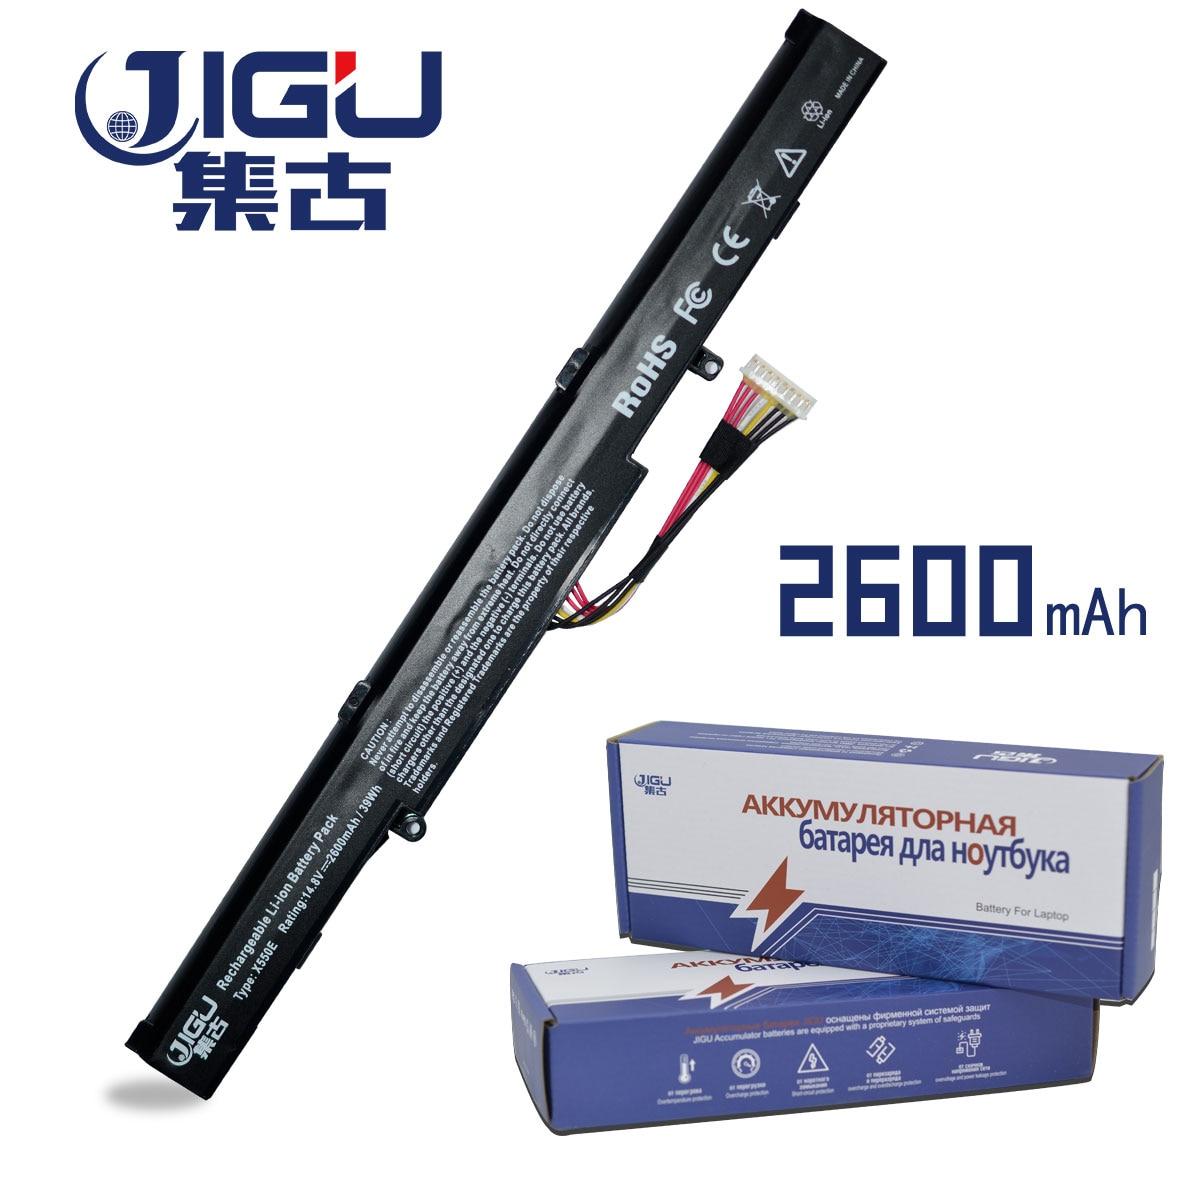 JIGU 2600MAH Laptop Battery A41-X550E For Asus X450 X450E X450J X550DP A450 A450C A450V F450 F450J K450J K550D K550E K751L R752L 4 cell a41 x550e battery for asus r752lj r752ld r752lb r752m r752l r751j x751m f450e x450e x450 x550 x550e x751l x751m page 9